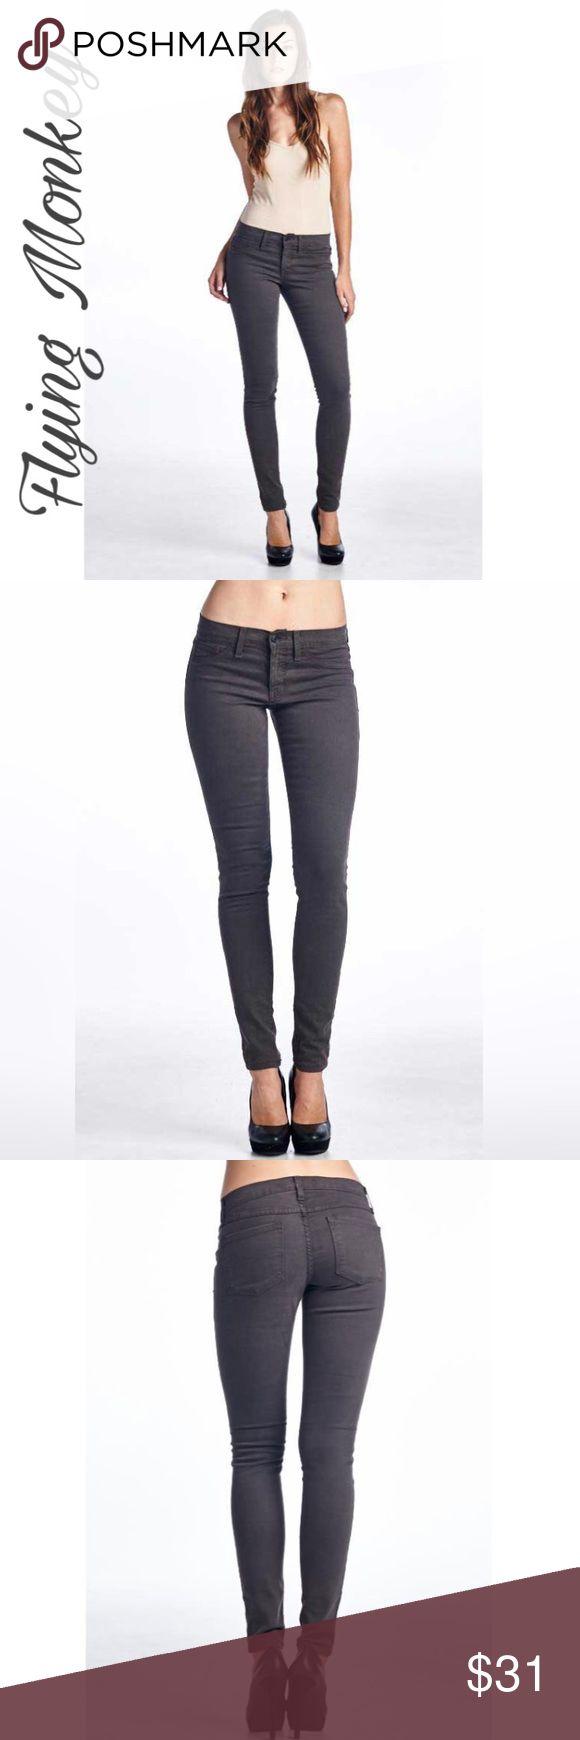 💝HP 2-8-17💝Flying Monkey Jeans Skinny Jeggings💝 💝Back to Basic Host Pick💝Grey skinny jeggings. 💝 Flying Monkey  Jeans Skinny